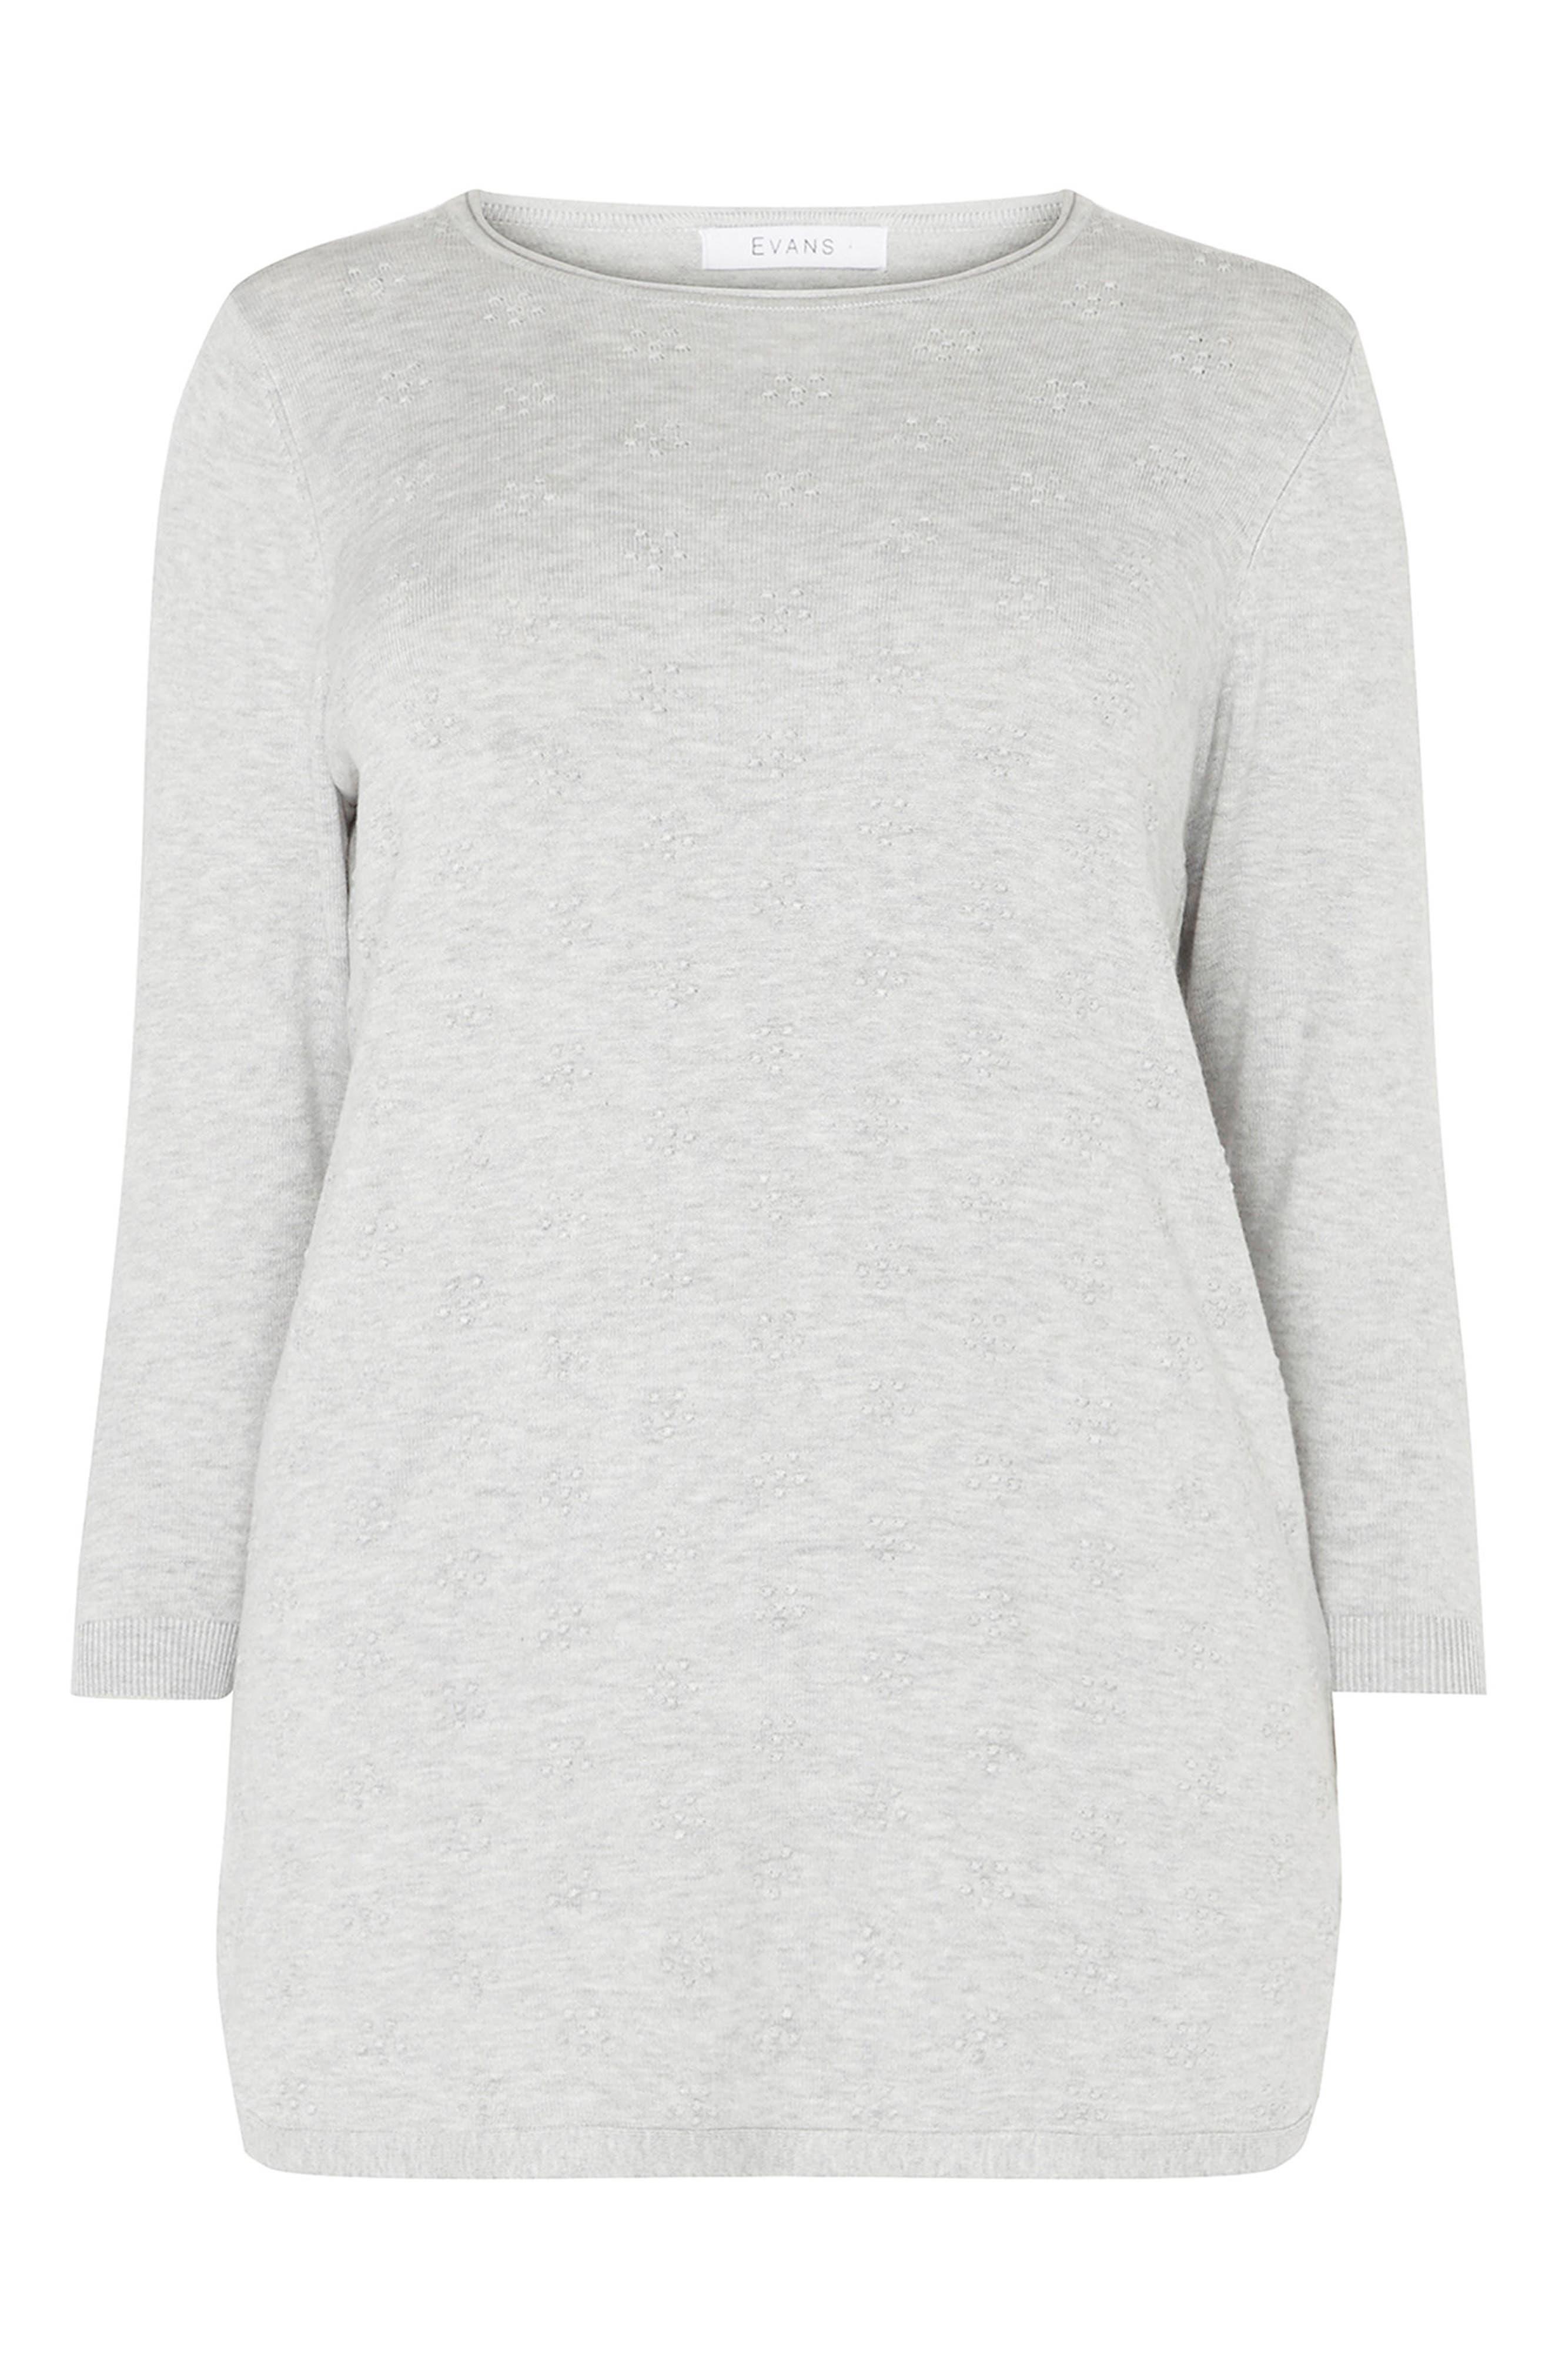 Dot Texture Sweater,                             Alternate thumbnail 4, color,                             020